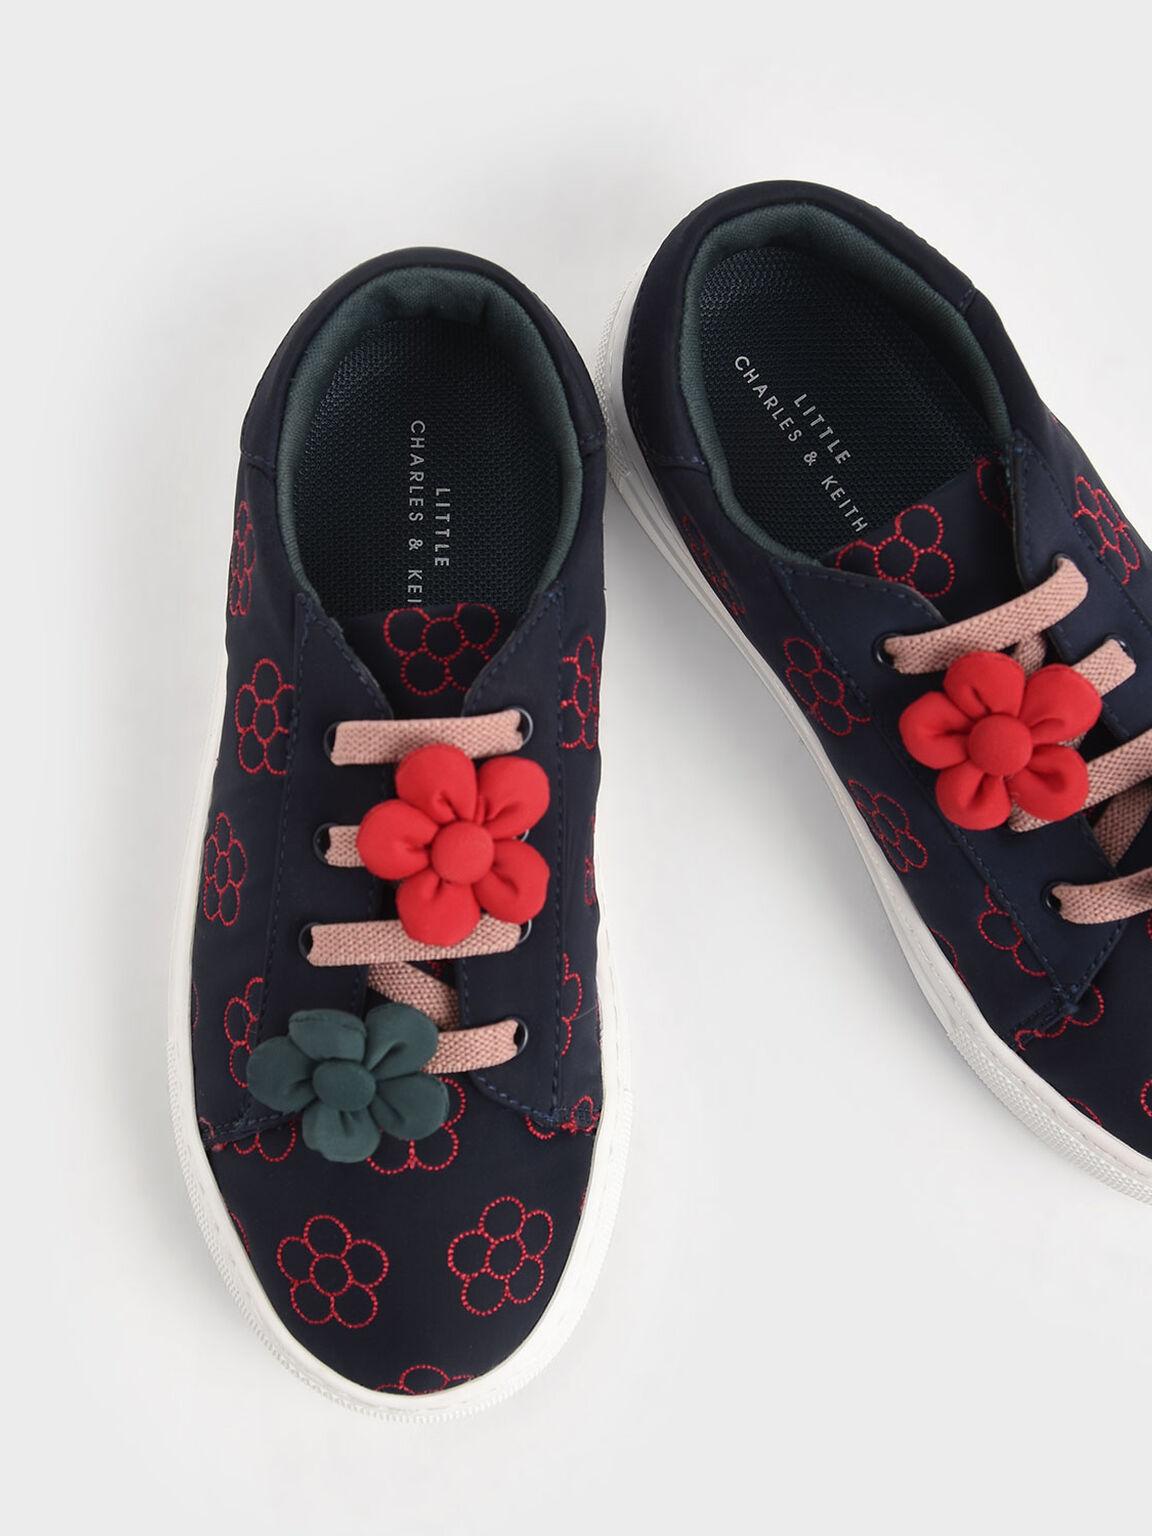 Girls' Flower Embellished Sneakers, Dark Blue, hi-res